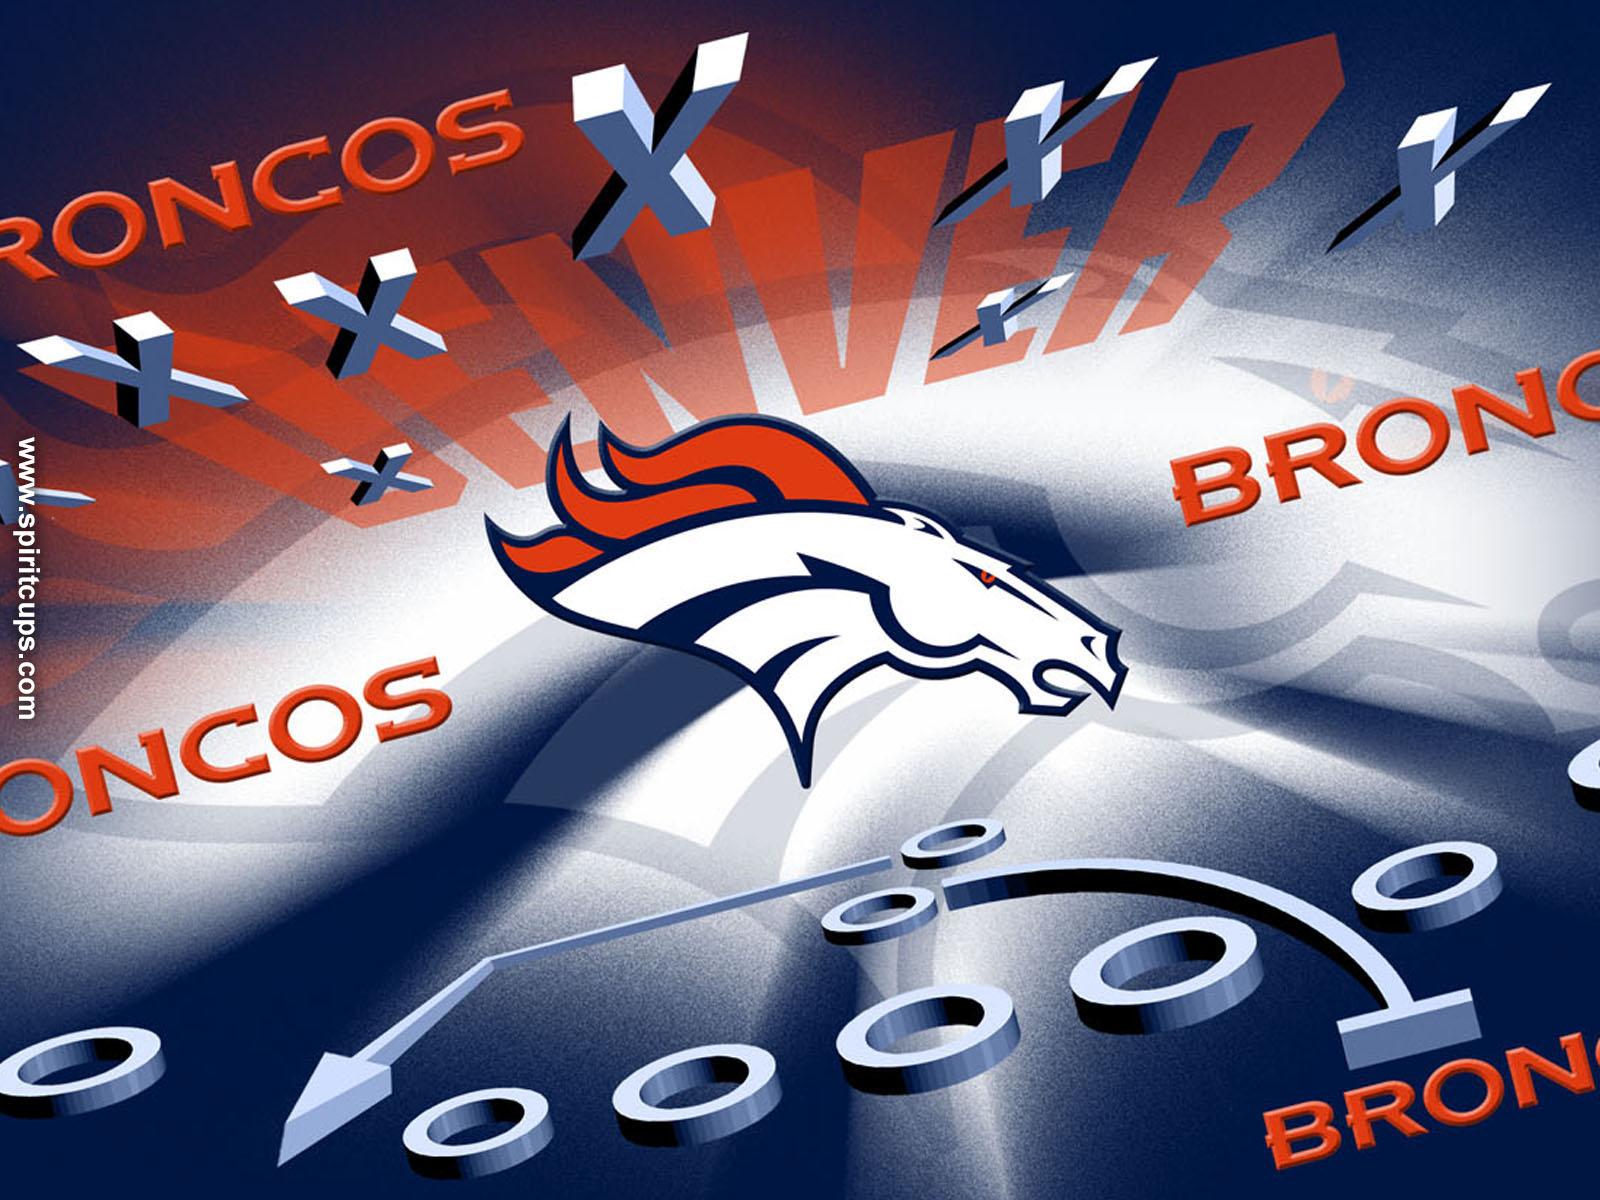 Broncos wallpaper download impremedia background of the day denver broncos denver broncos wallpapers voltagebd Gallery